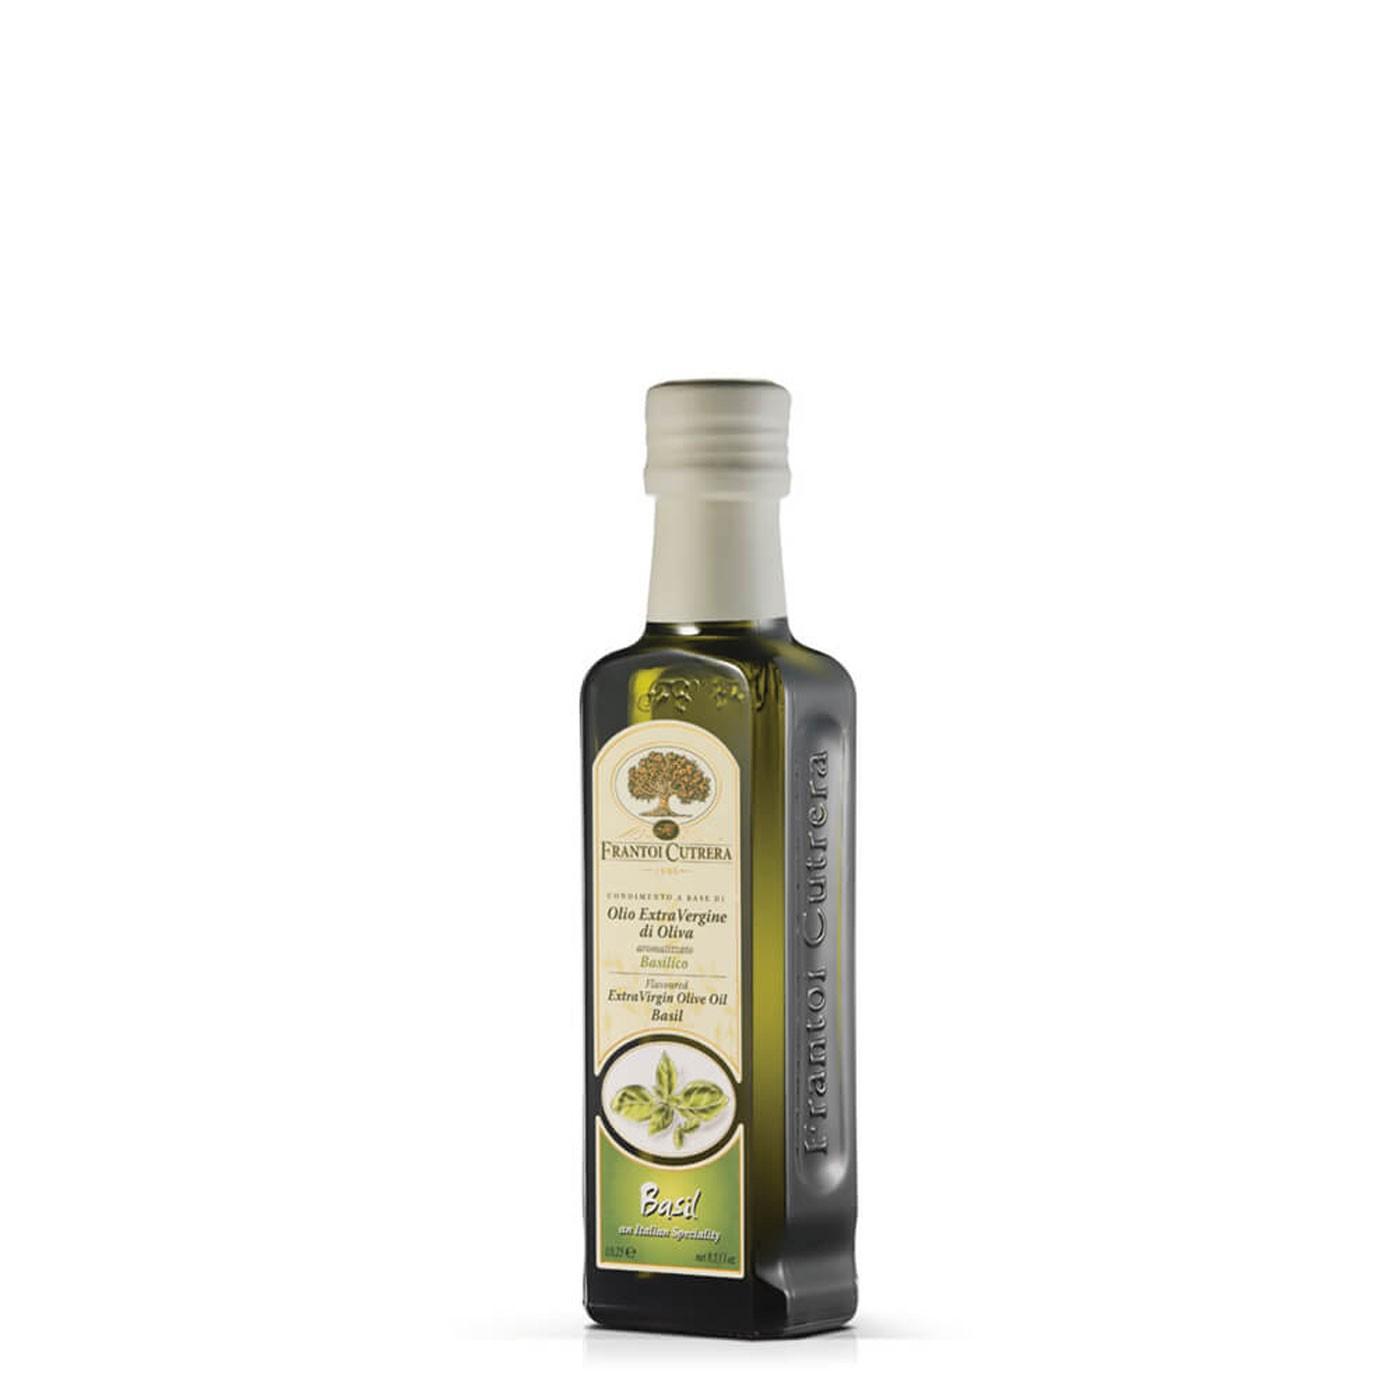 Basil Infused Extra Virgin Olive Oil 8.45 oz